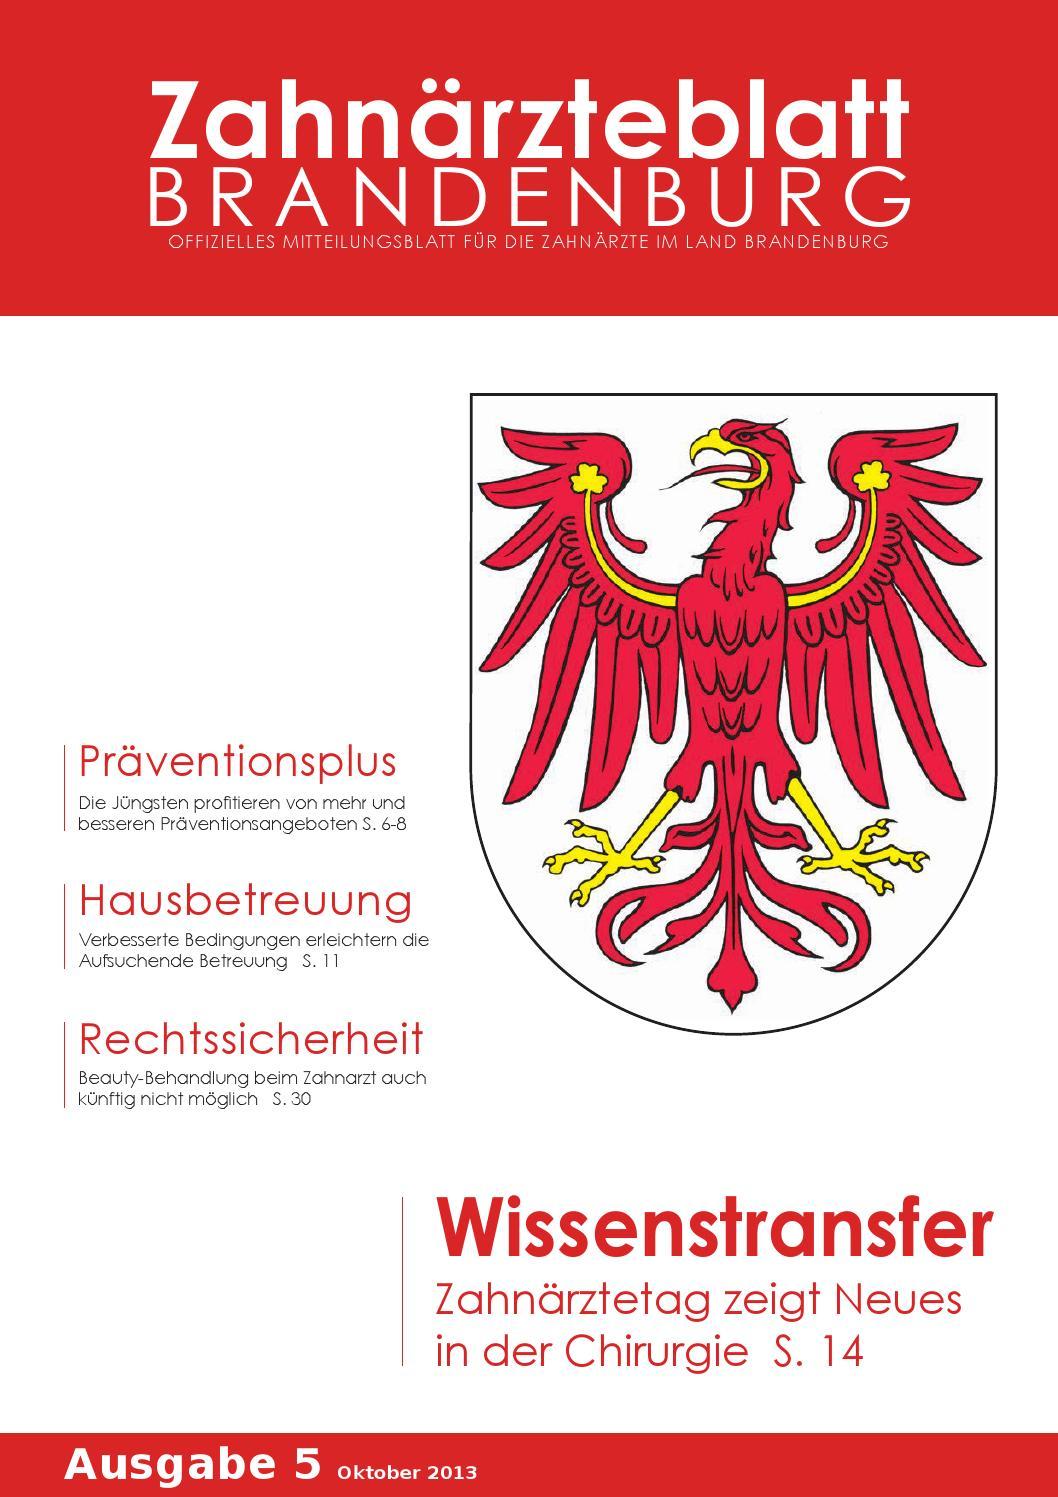 ZBB Ausgabe 5/2013 by KZVLB - issuu